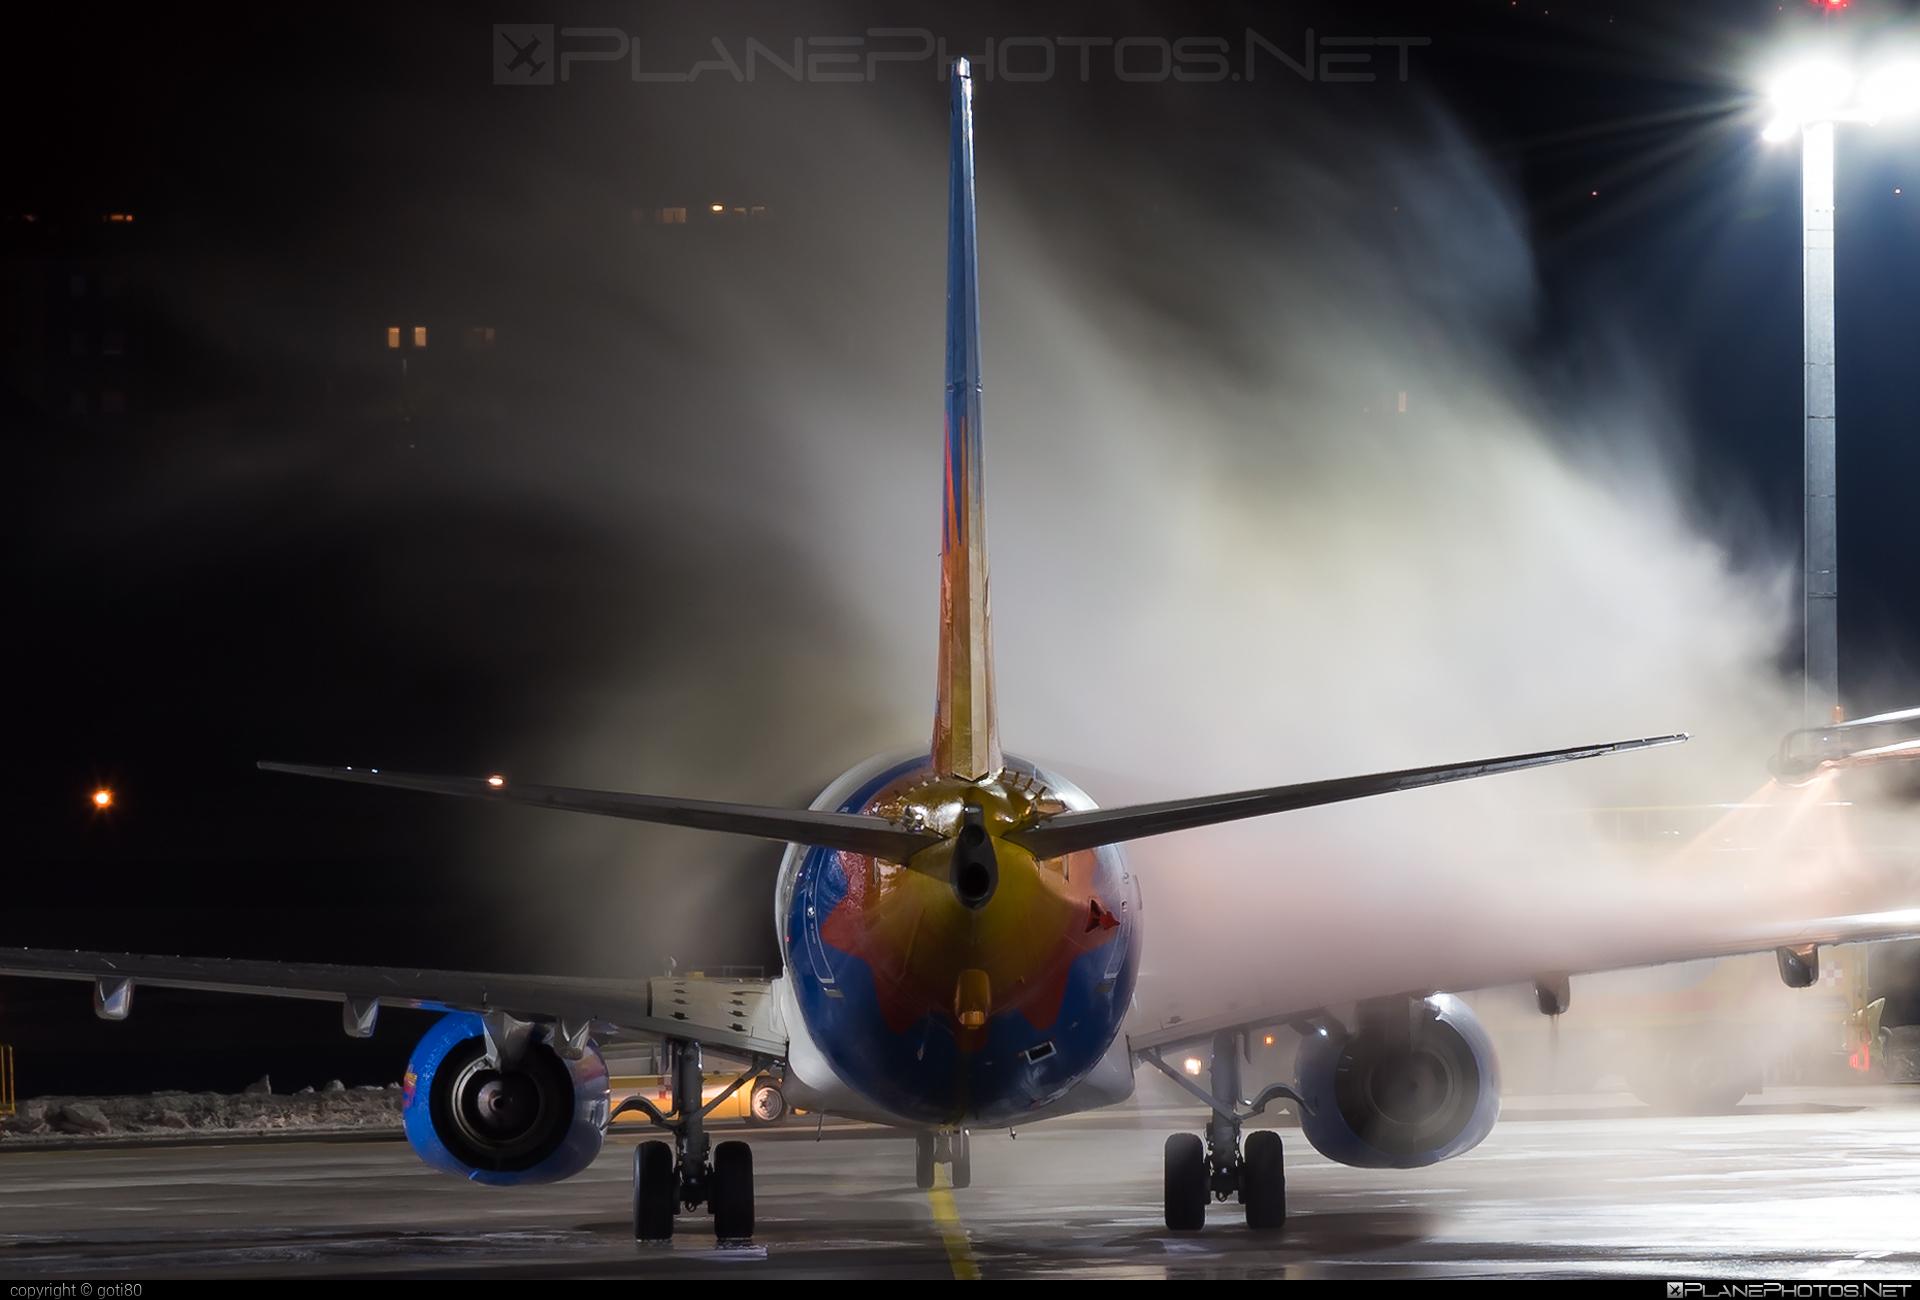 Boeing 737-800 - G-JZBE operated by Jet2 #b737 #b737nextgen #b737ng #boeing #boeing737 #jet2